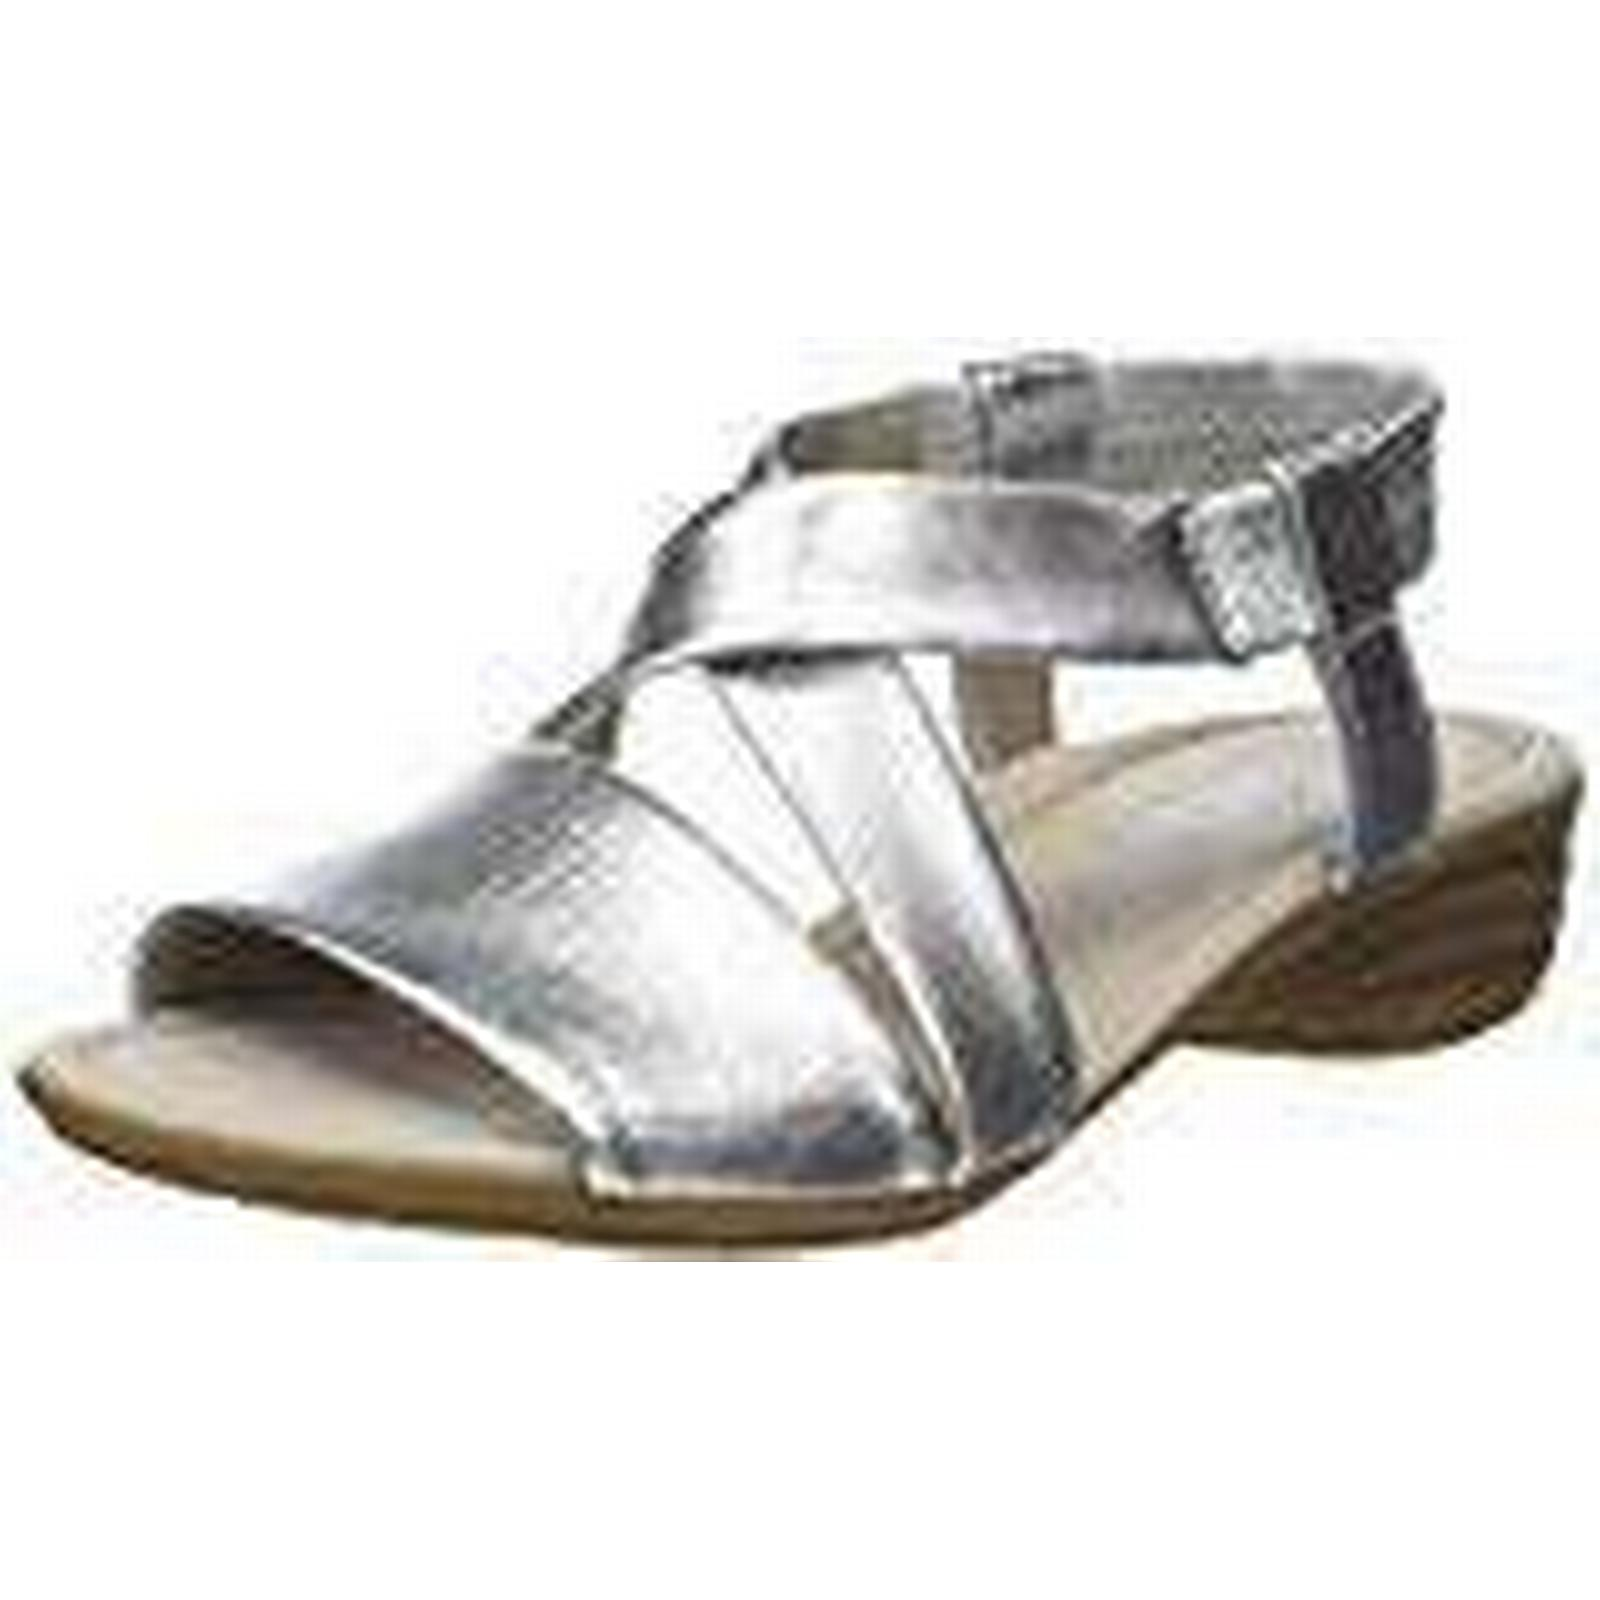 Gabor Women Casual Ankle 3 Strap Sandals, Multicolor (Silber), 3 Ankle UK (35.5 EU) 064a3e